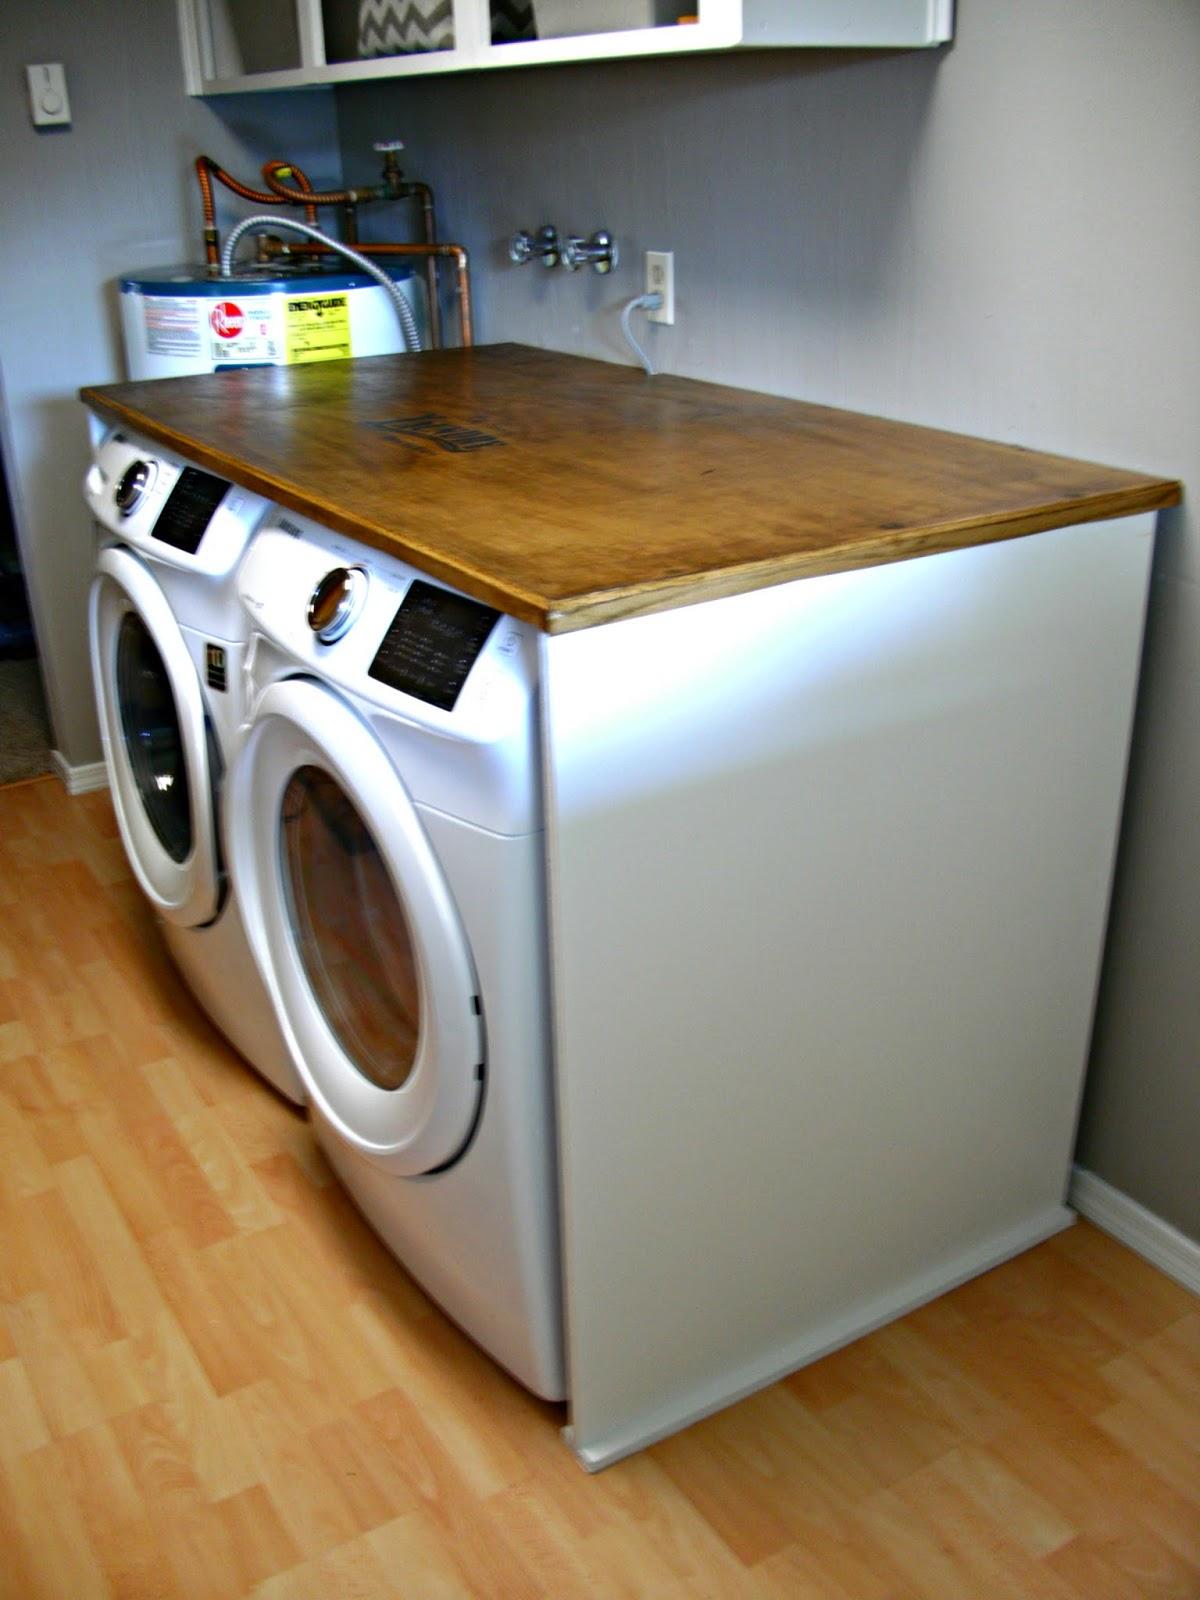 Laundry Room Redo - DIY Laundry Folding Table - Little ...